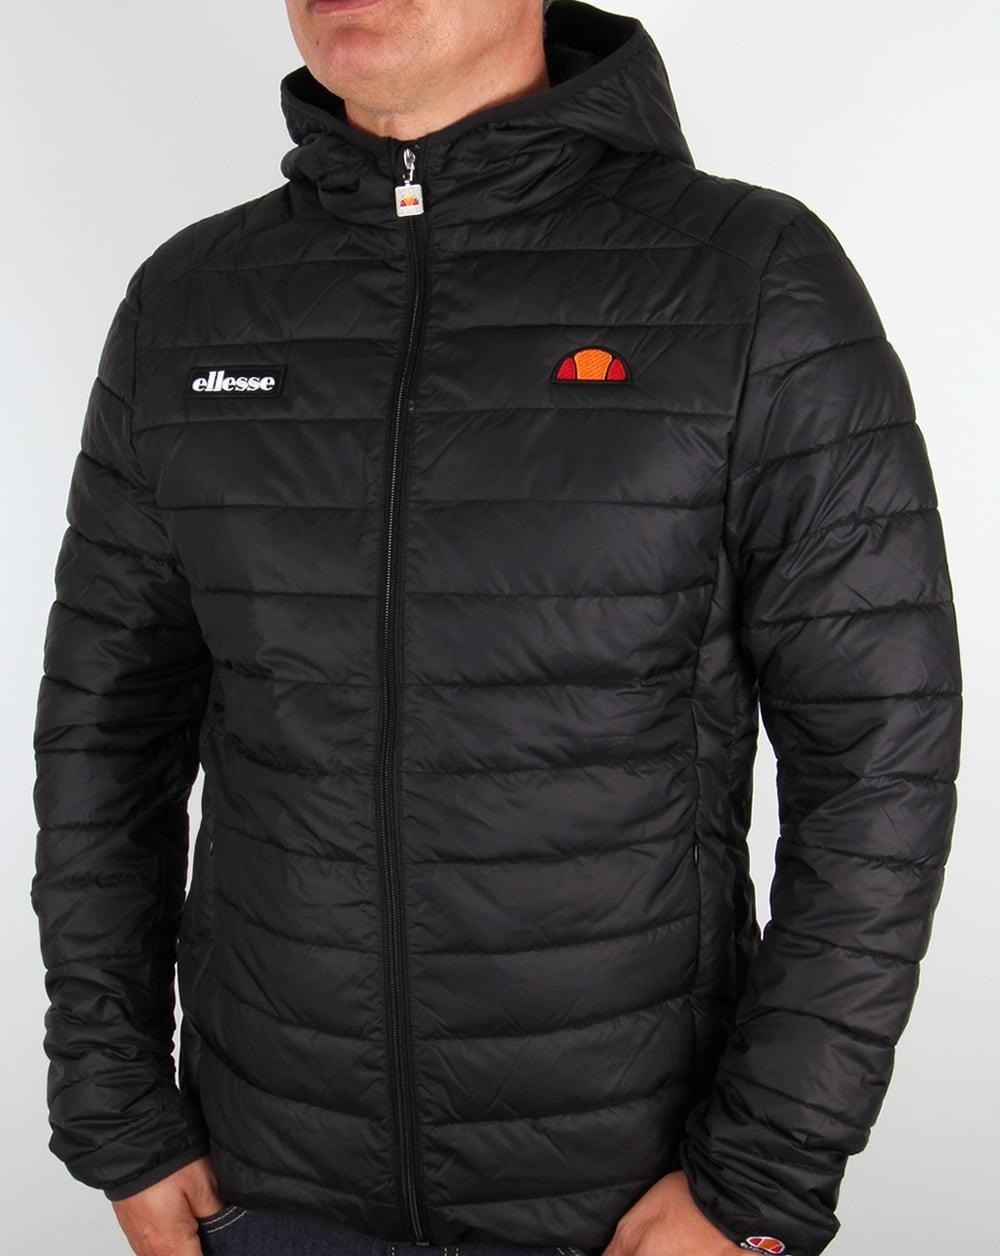 Ellesse Lombardy Jacket Black, Bubble,Hooded, puffer,ski ...